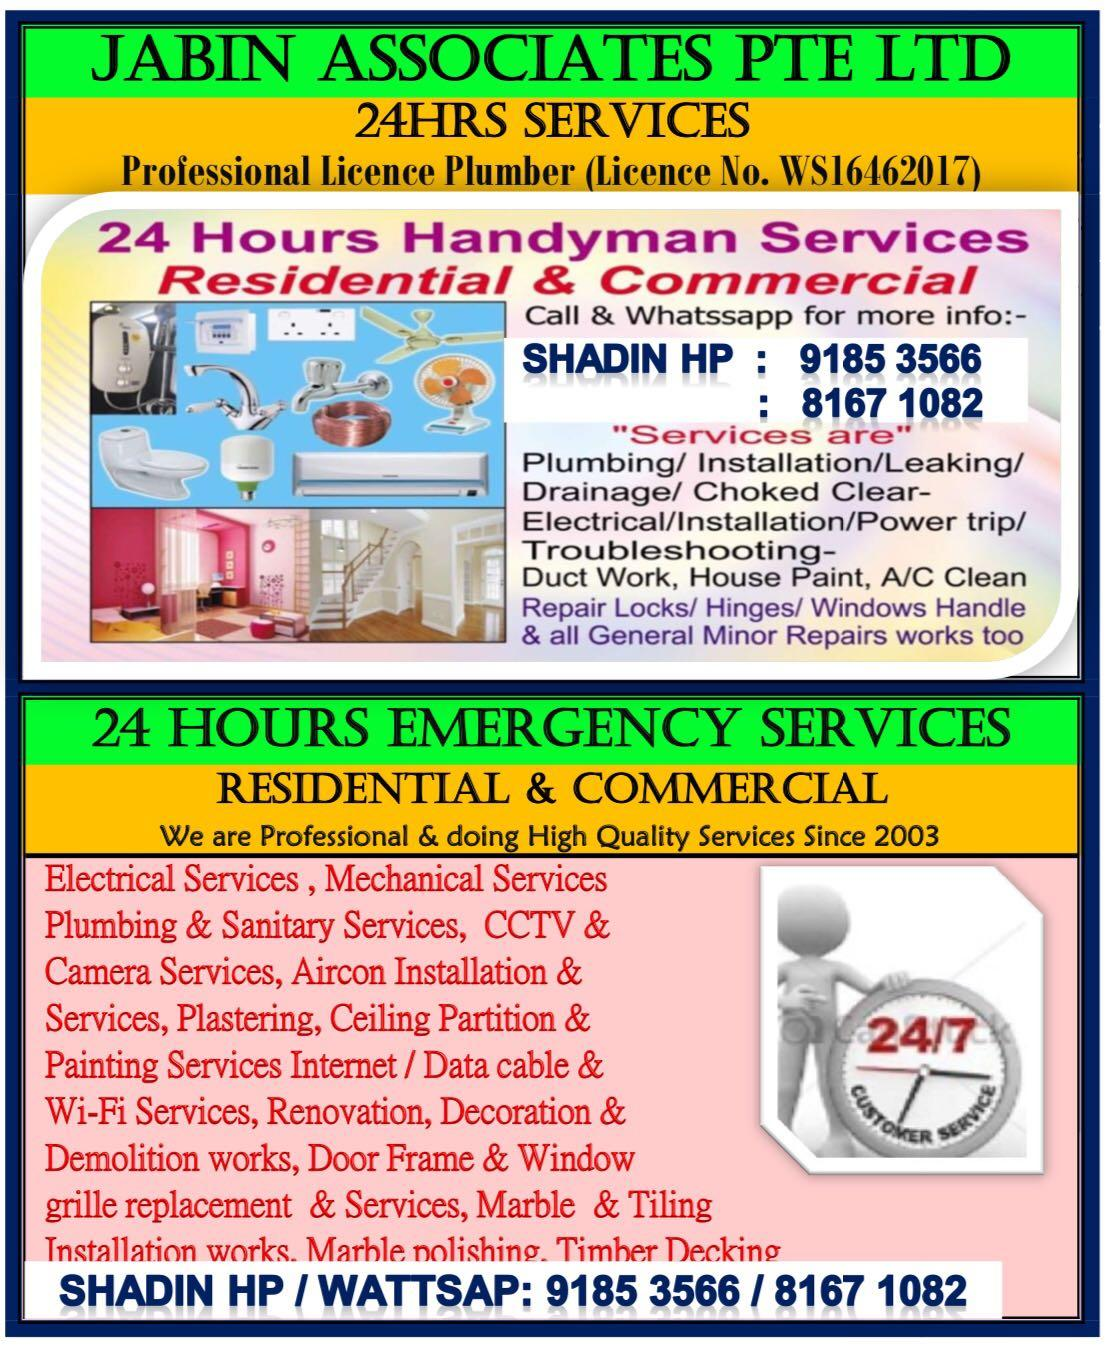 24hrs Handyman Services. Pls call phone call / wattsapp no: Shadin:91853566 / 81671082. Licence Plumber & Electrician